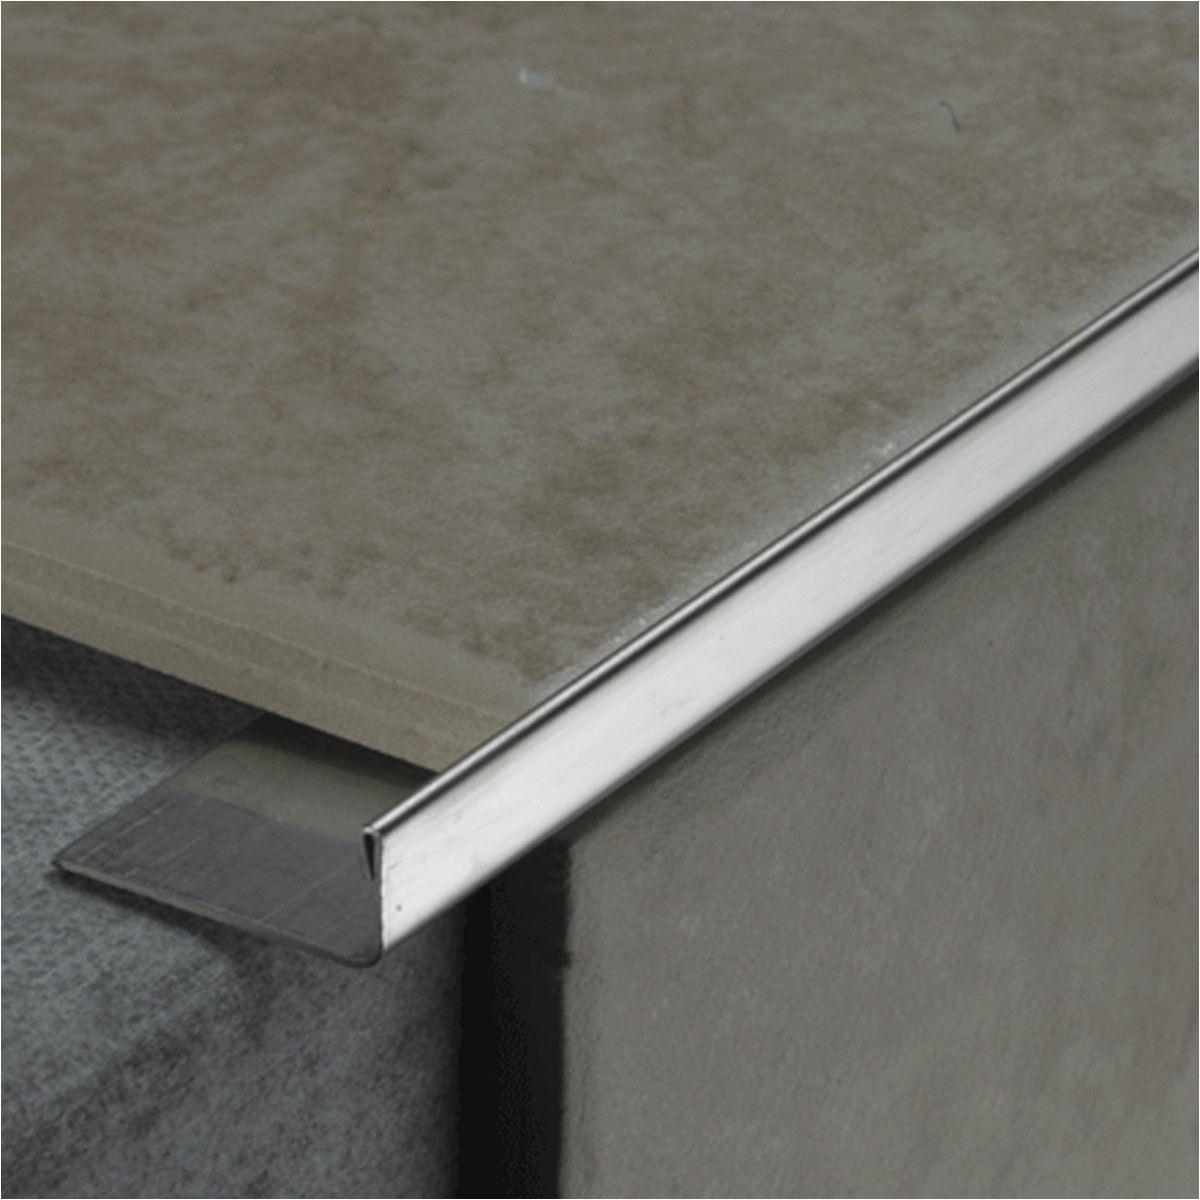 8mm l shape trim silver gloss sku 903030 tile choice